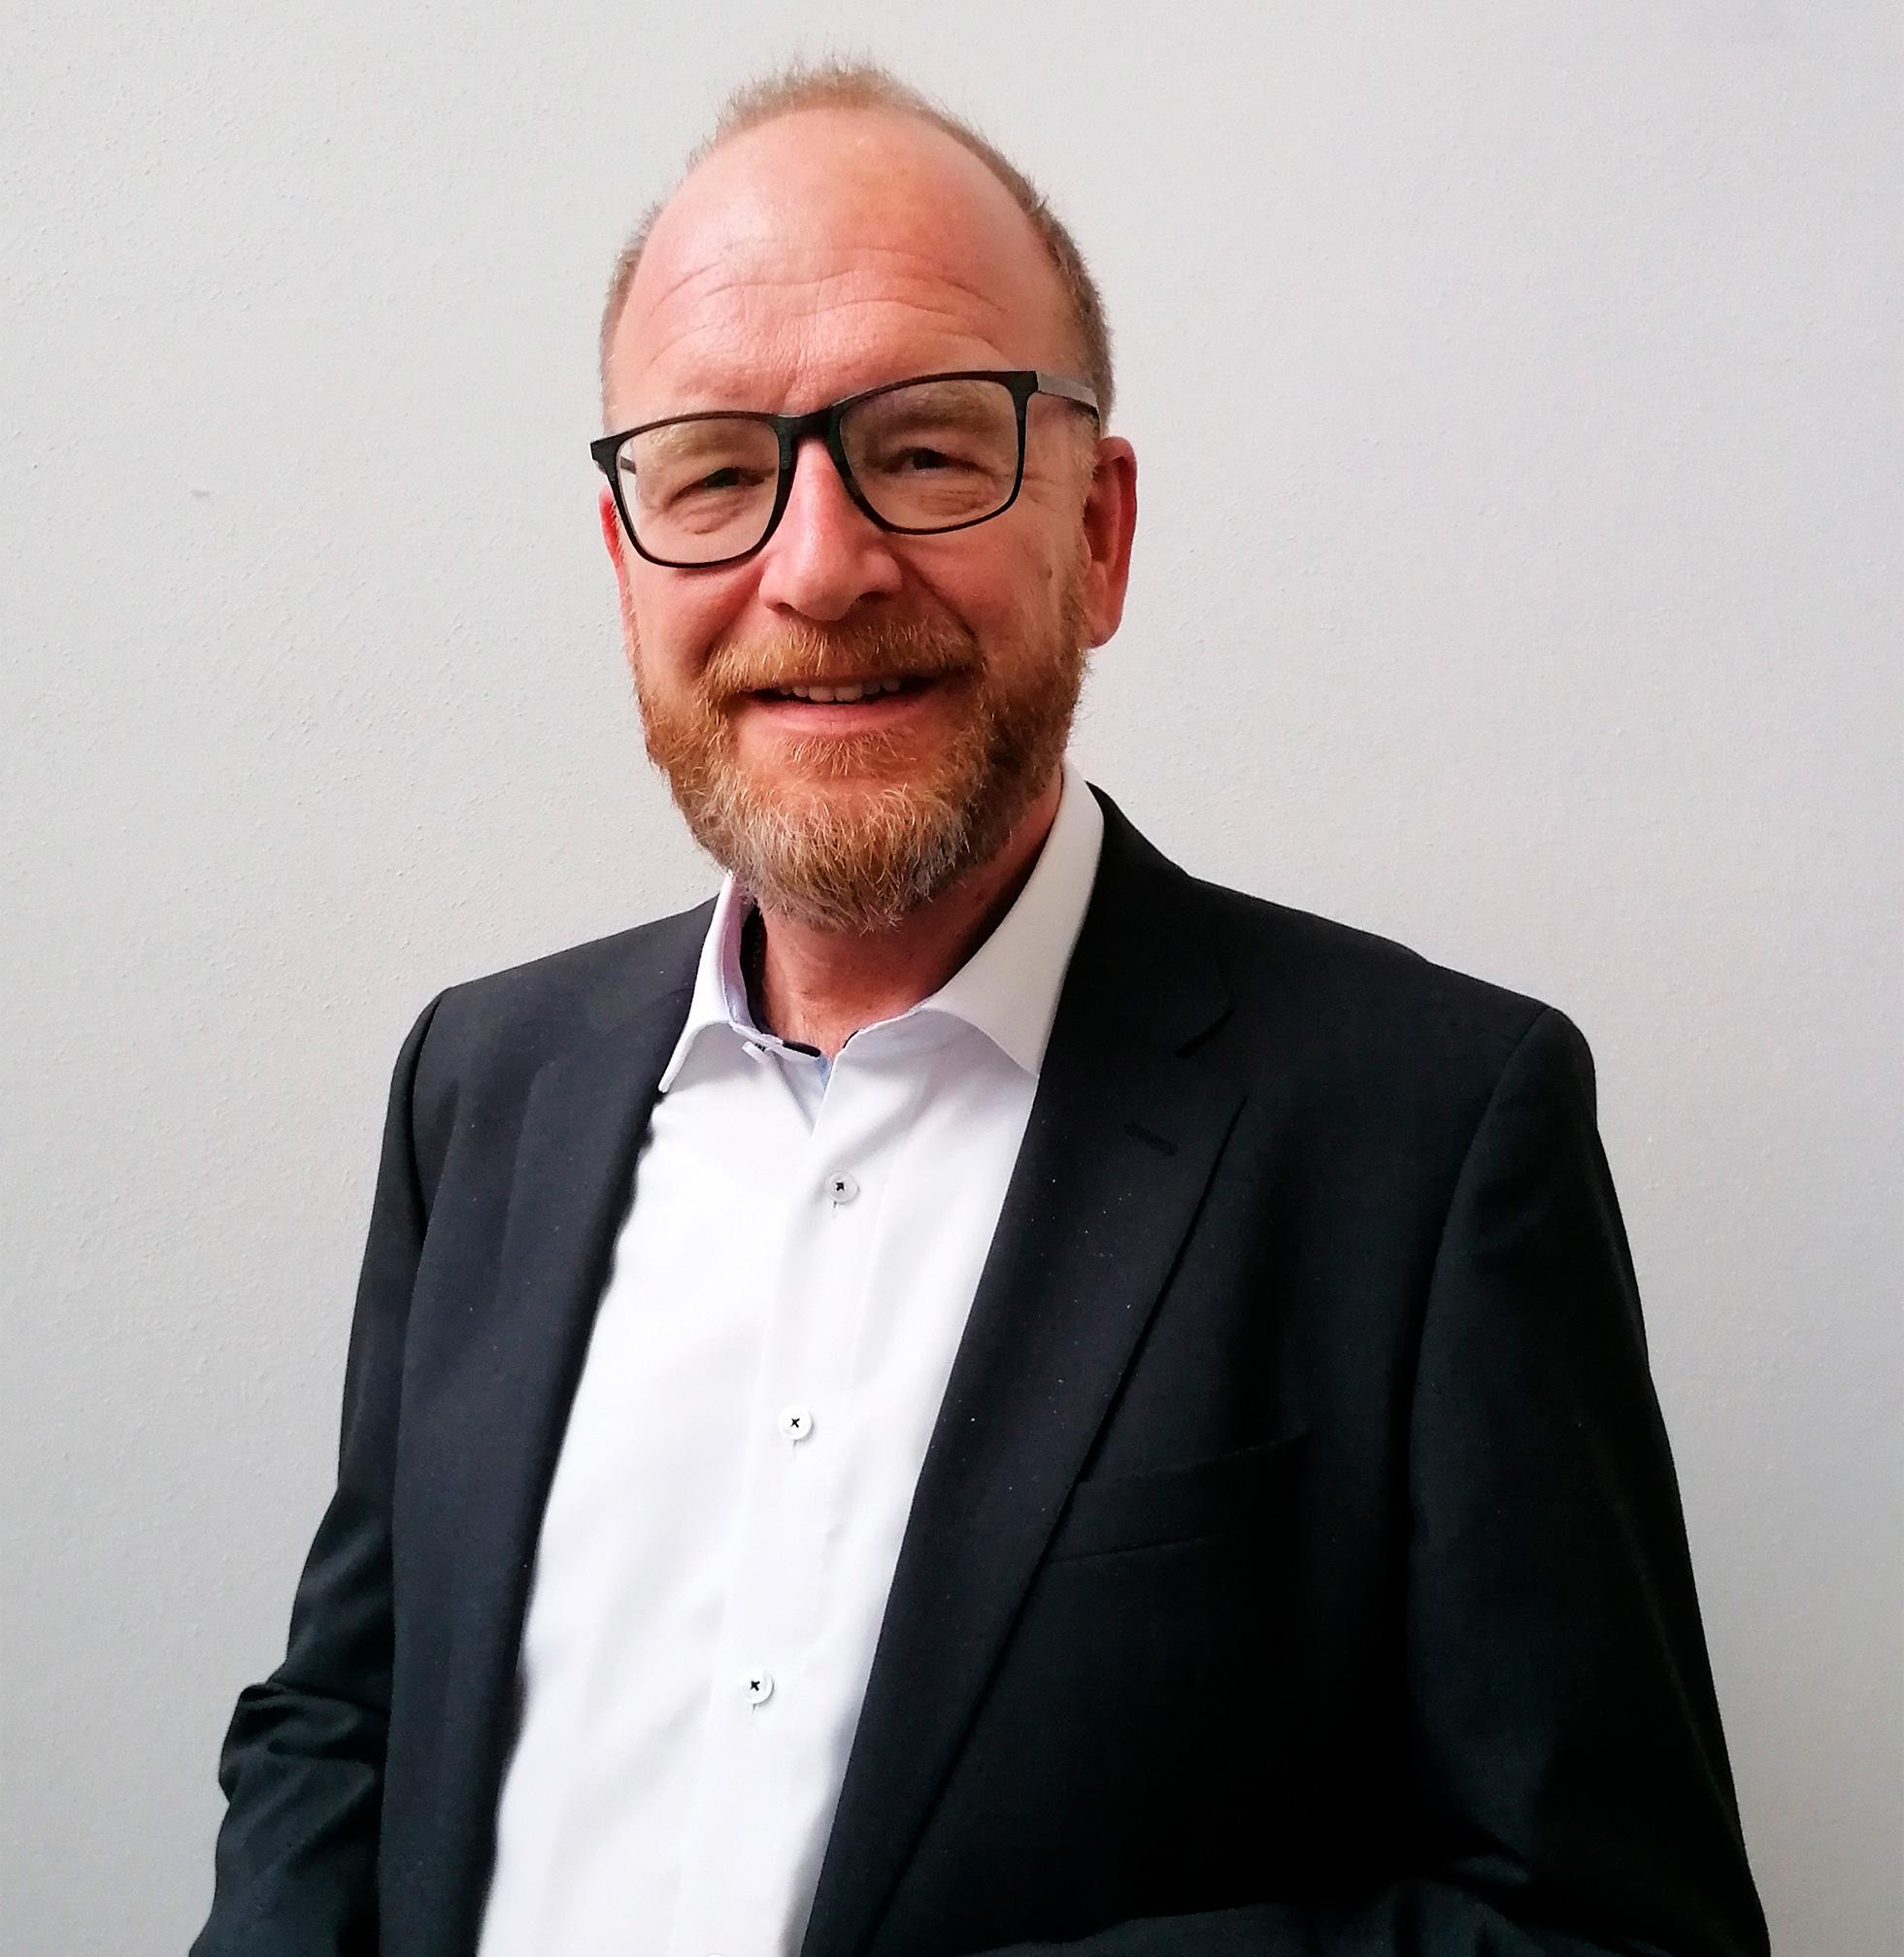 Andreas Albus